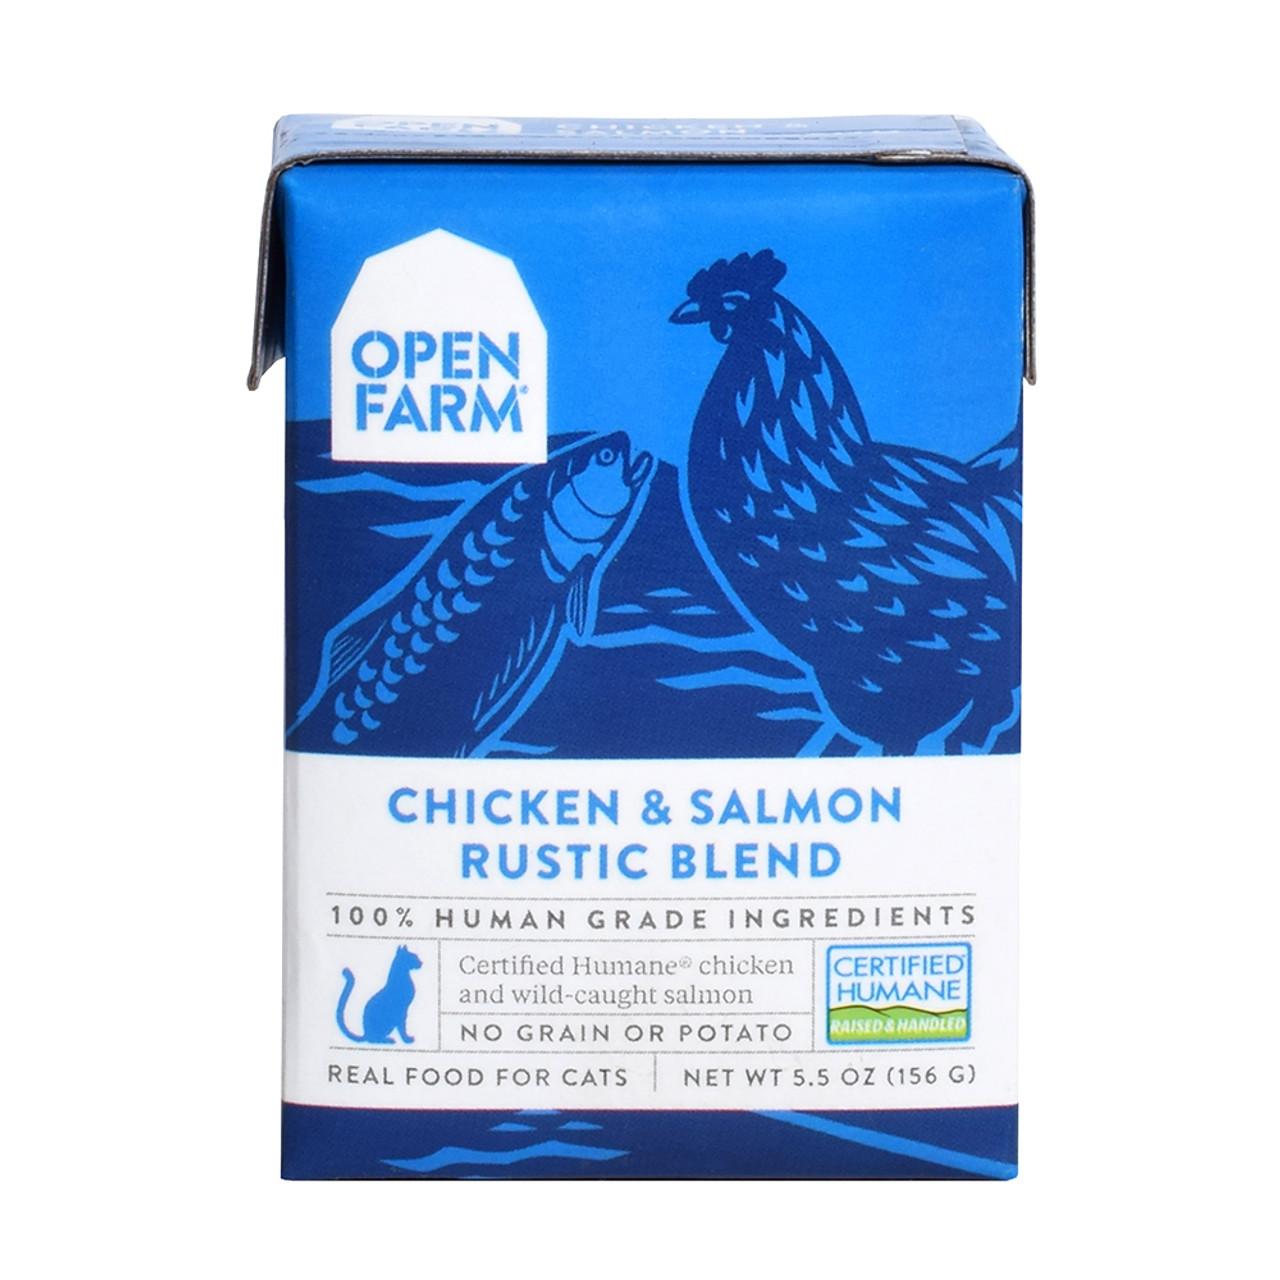 Open Farm Chicken & Salmon Rustic Blend Wet Cat Food Tetra Pack